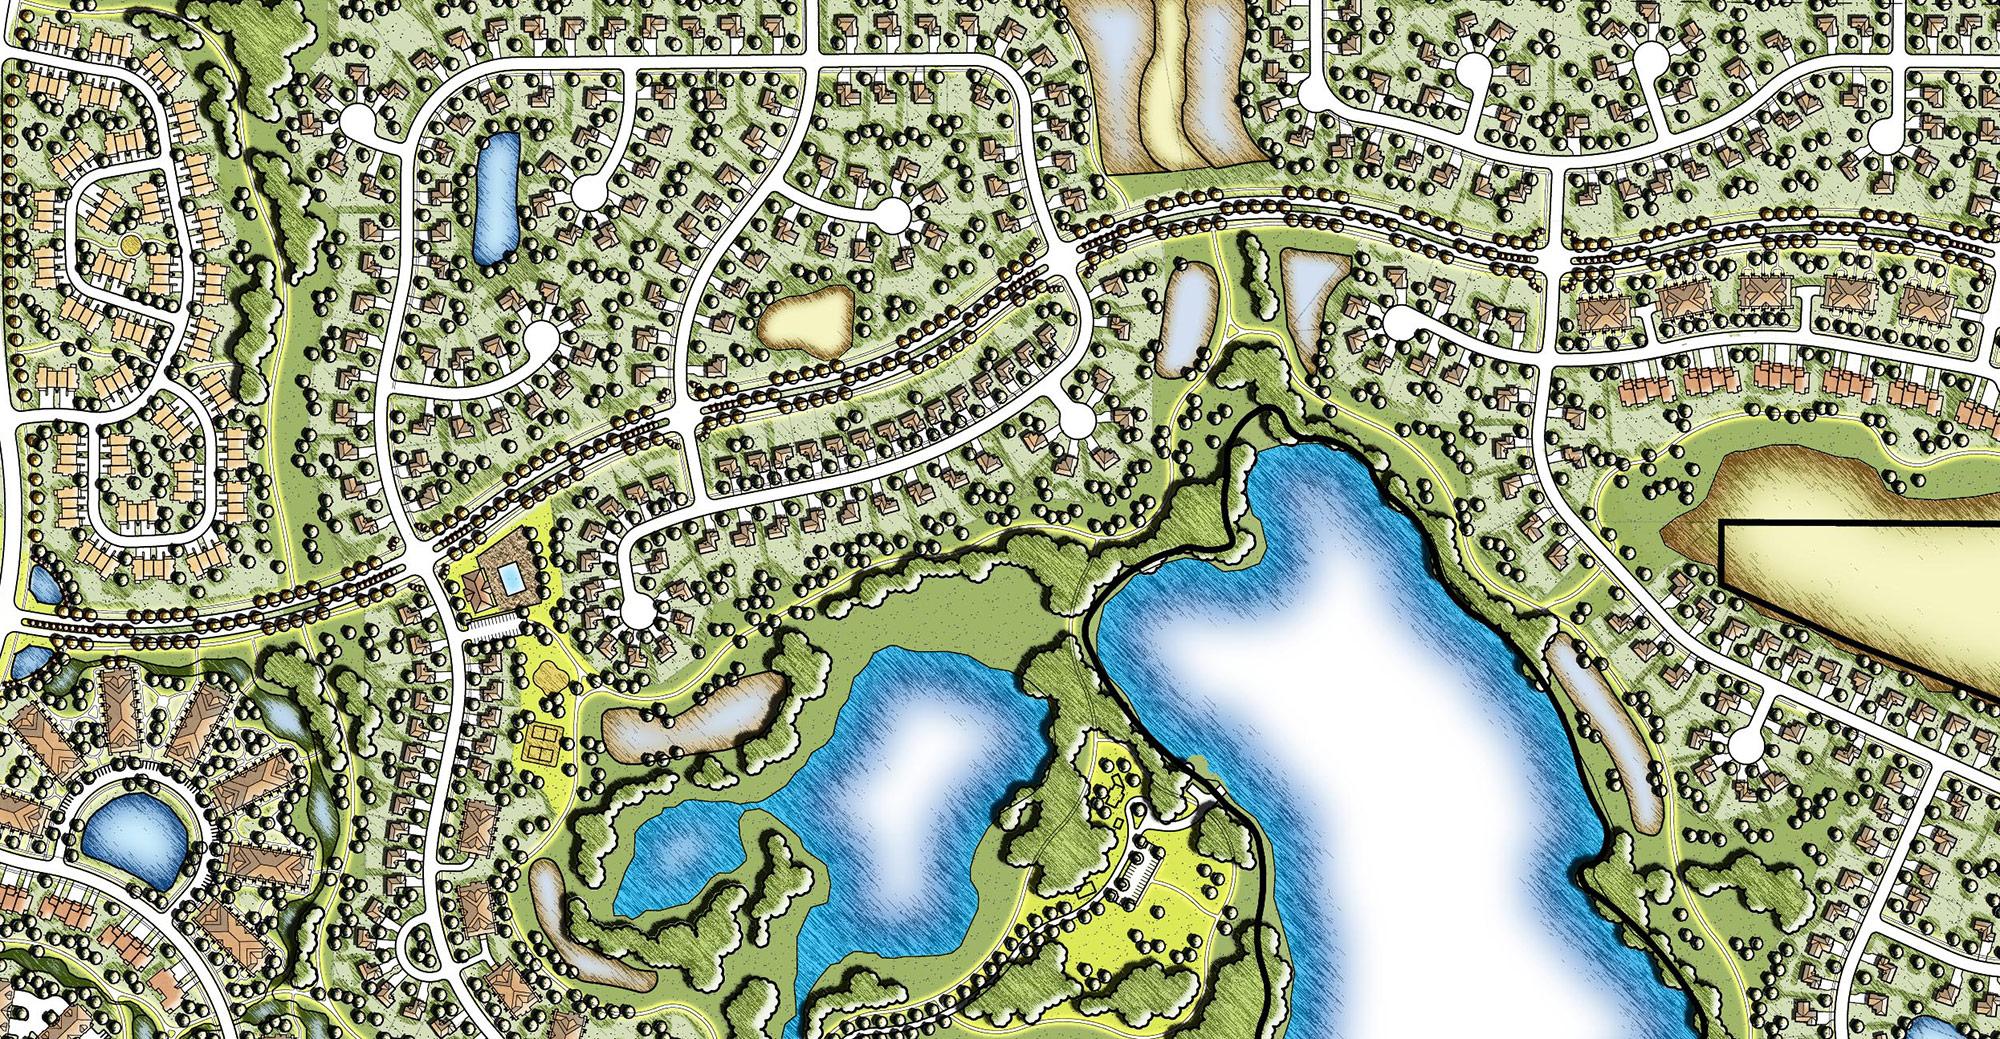 Edgewater Subdivision Services